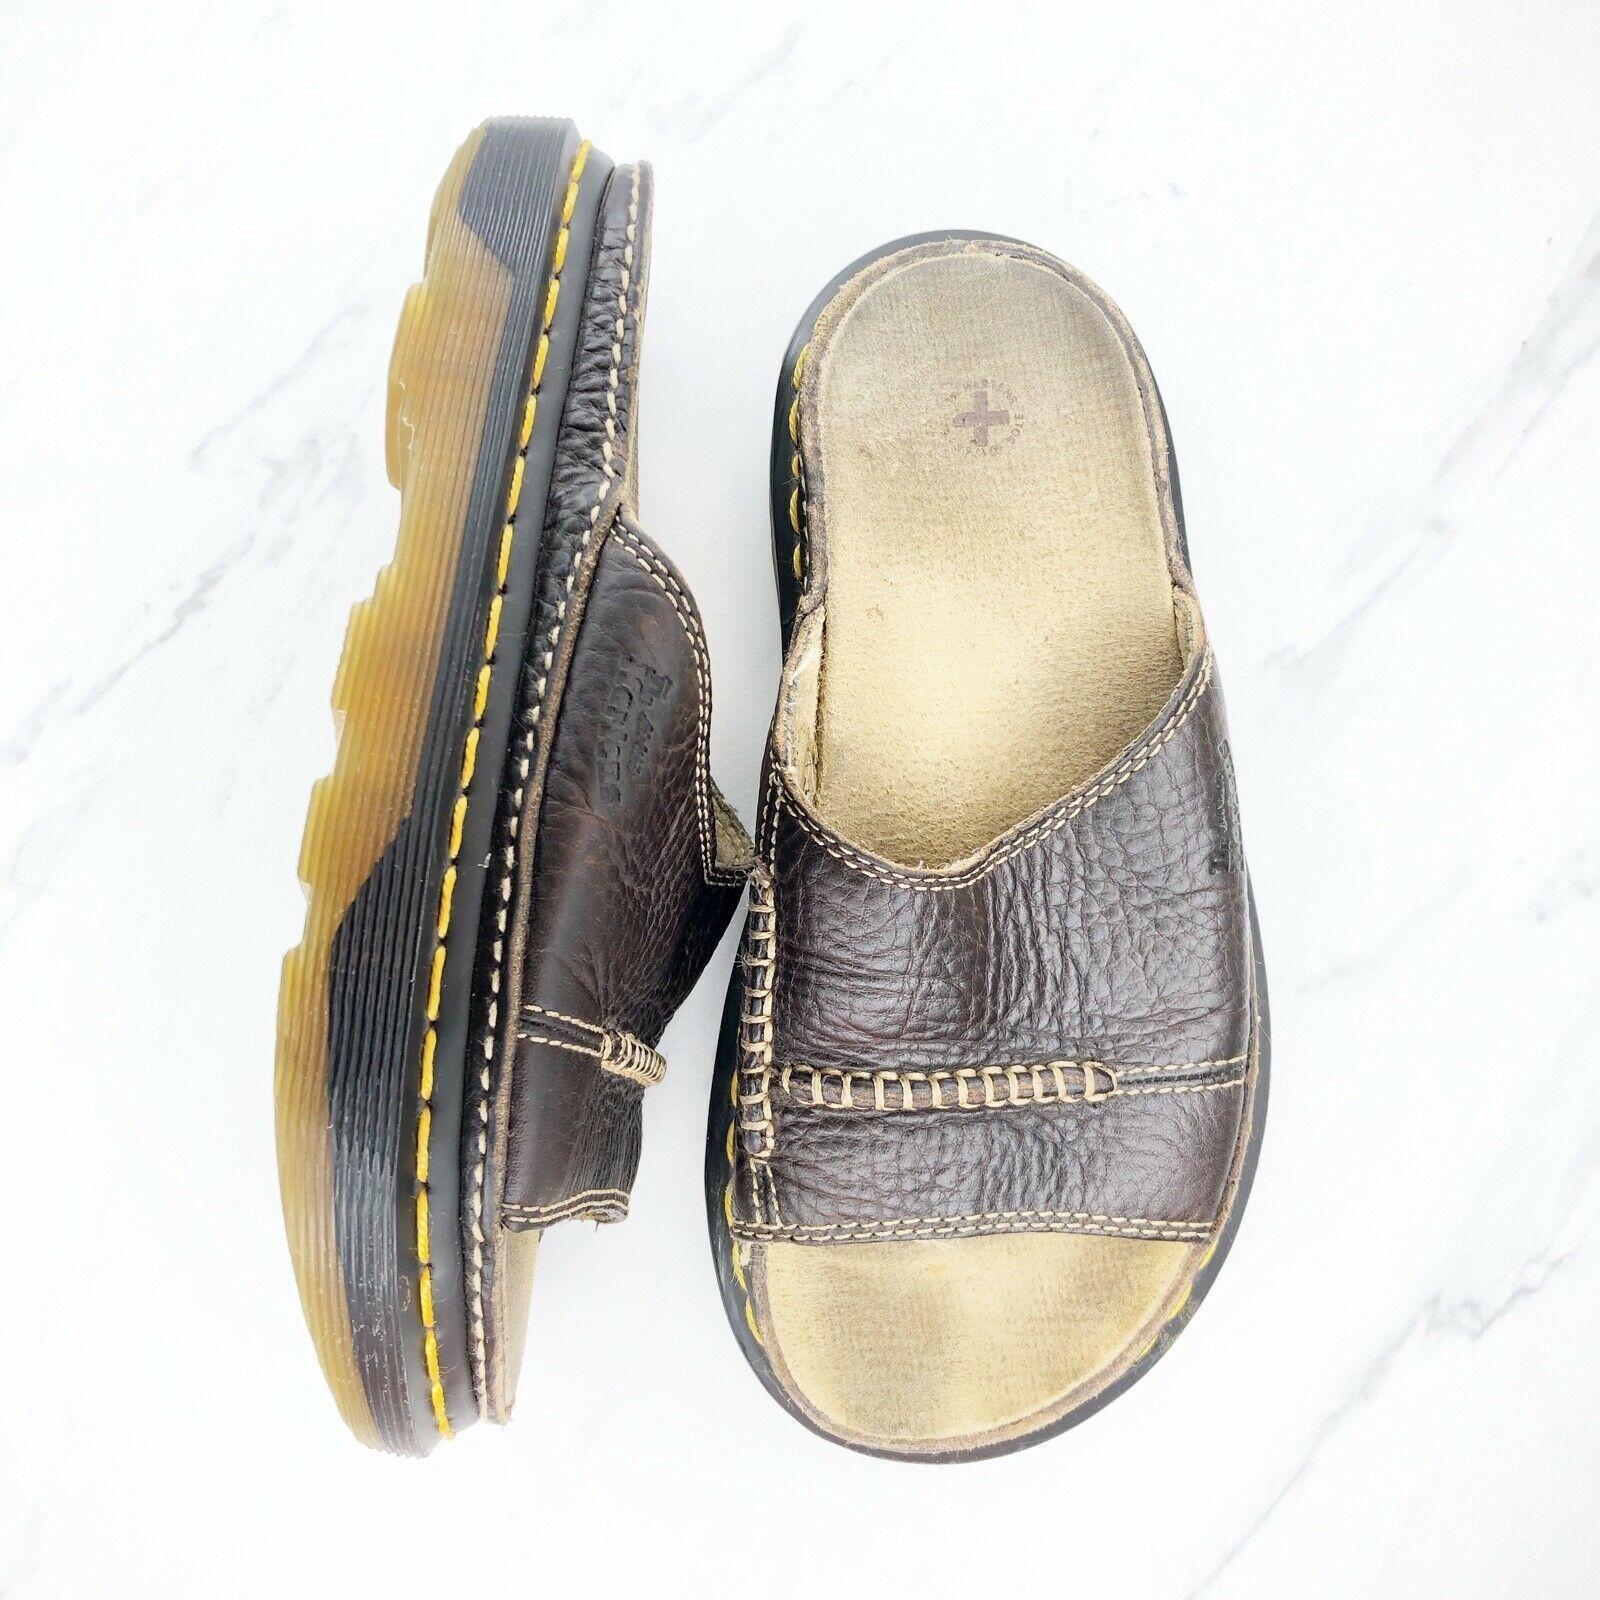 Dr. Martens Women's 6 M Brown Leather Sandals Slides Shoes